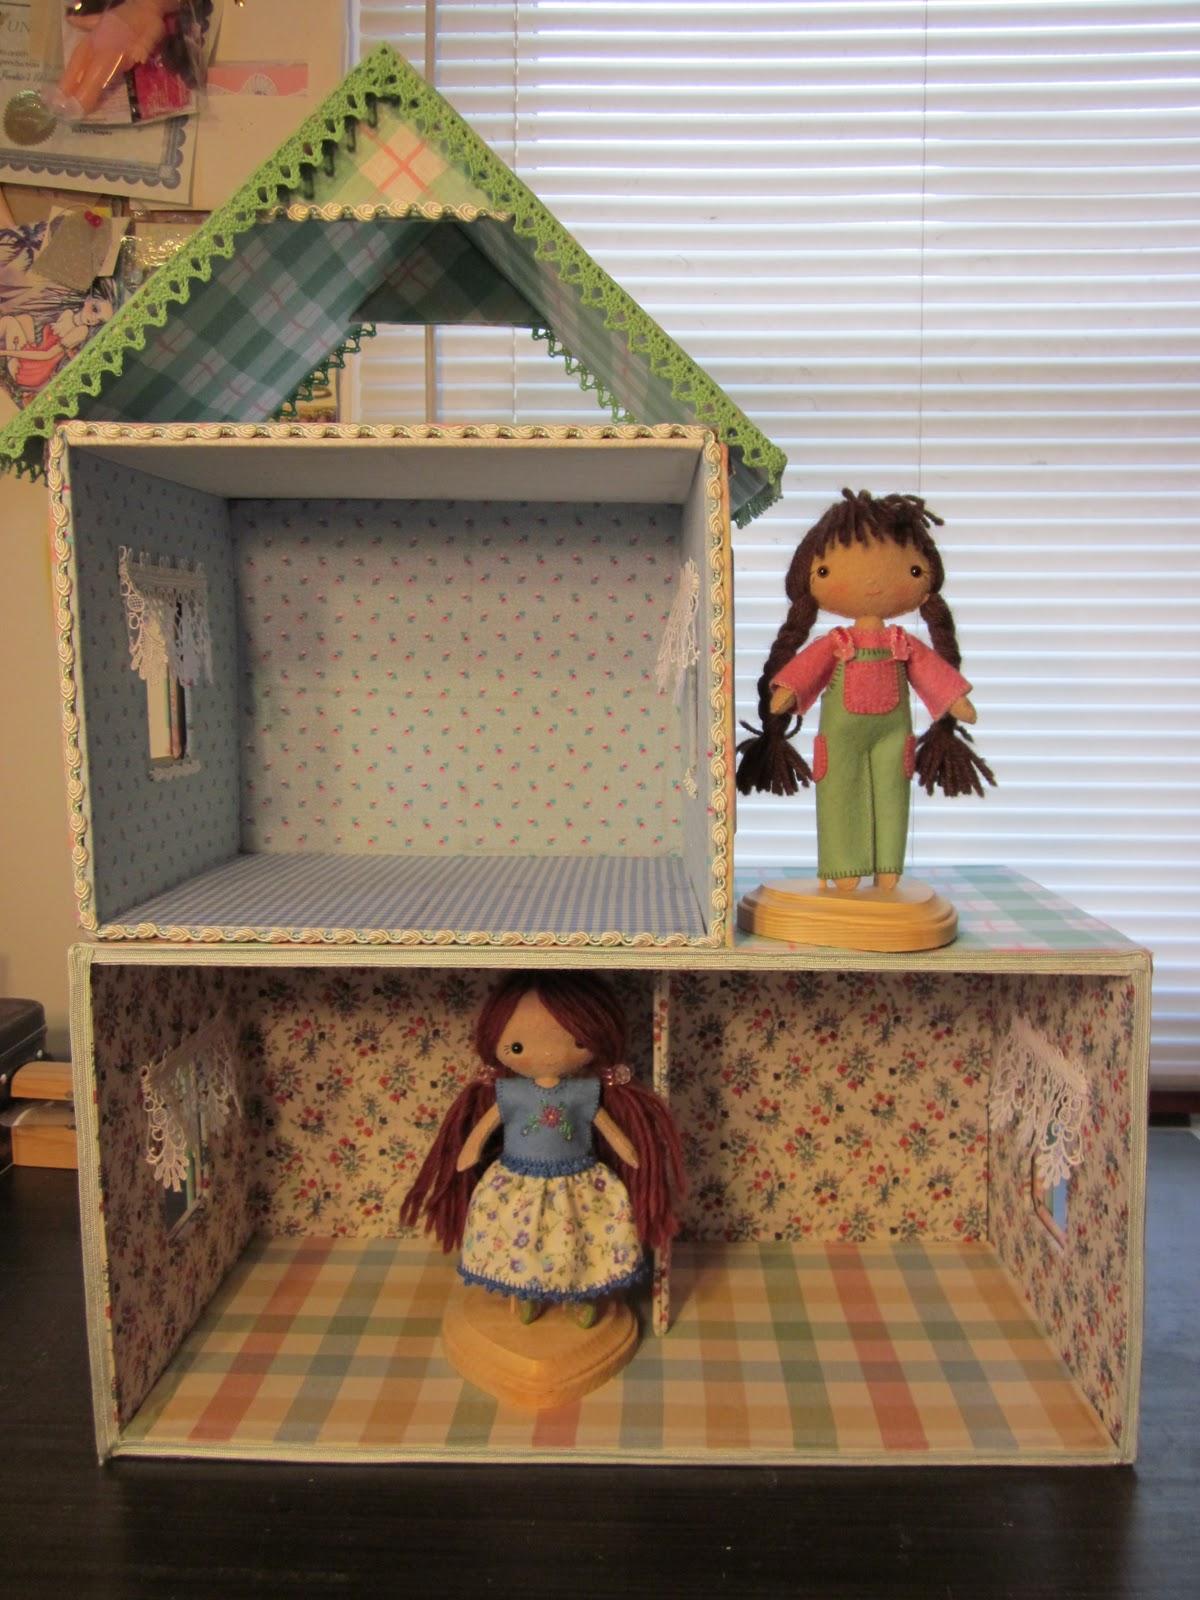 by hook by hand wren 39 s nest a cardboard cottage dollhouse. Black Bedroom Furniture Sets. Home Design Ideas